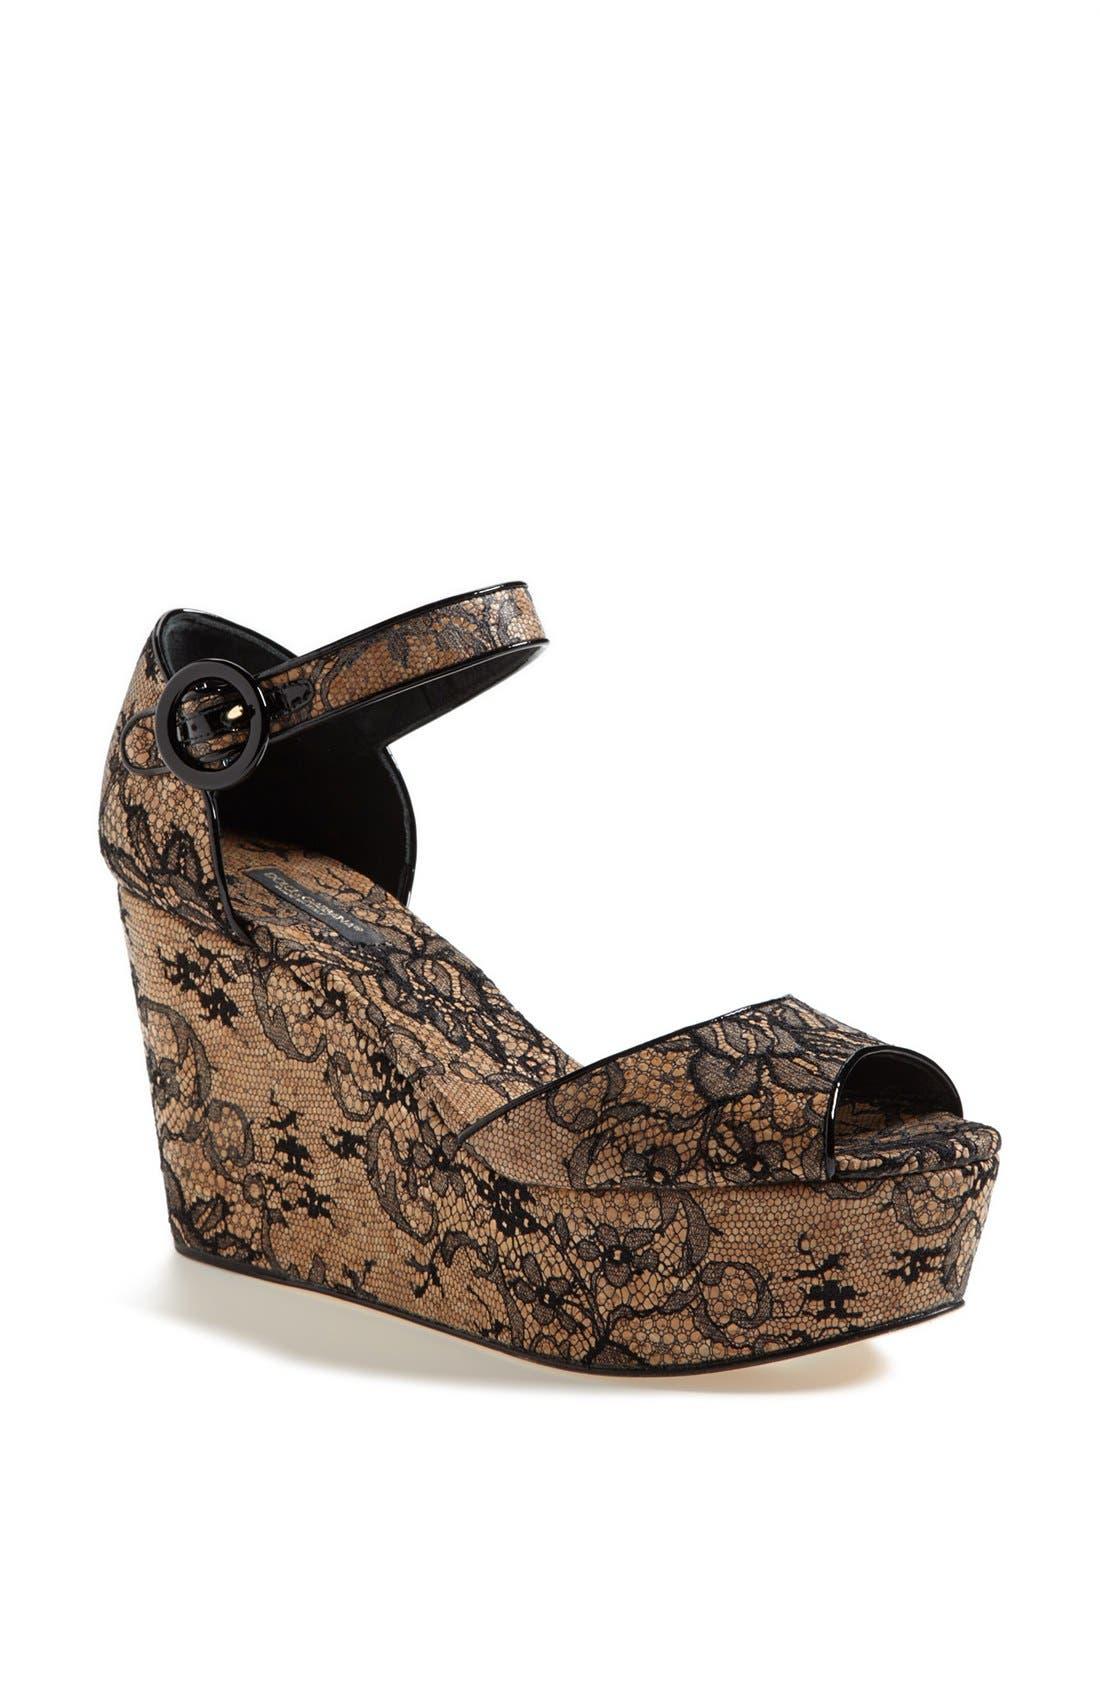 Main Image - Dolce&Gabbana Lace Wedge Sandal